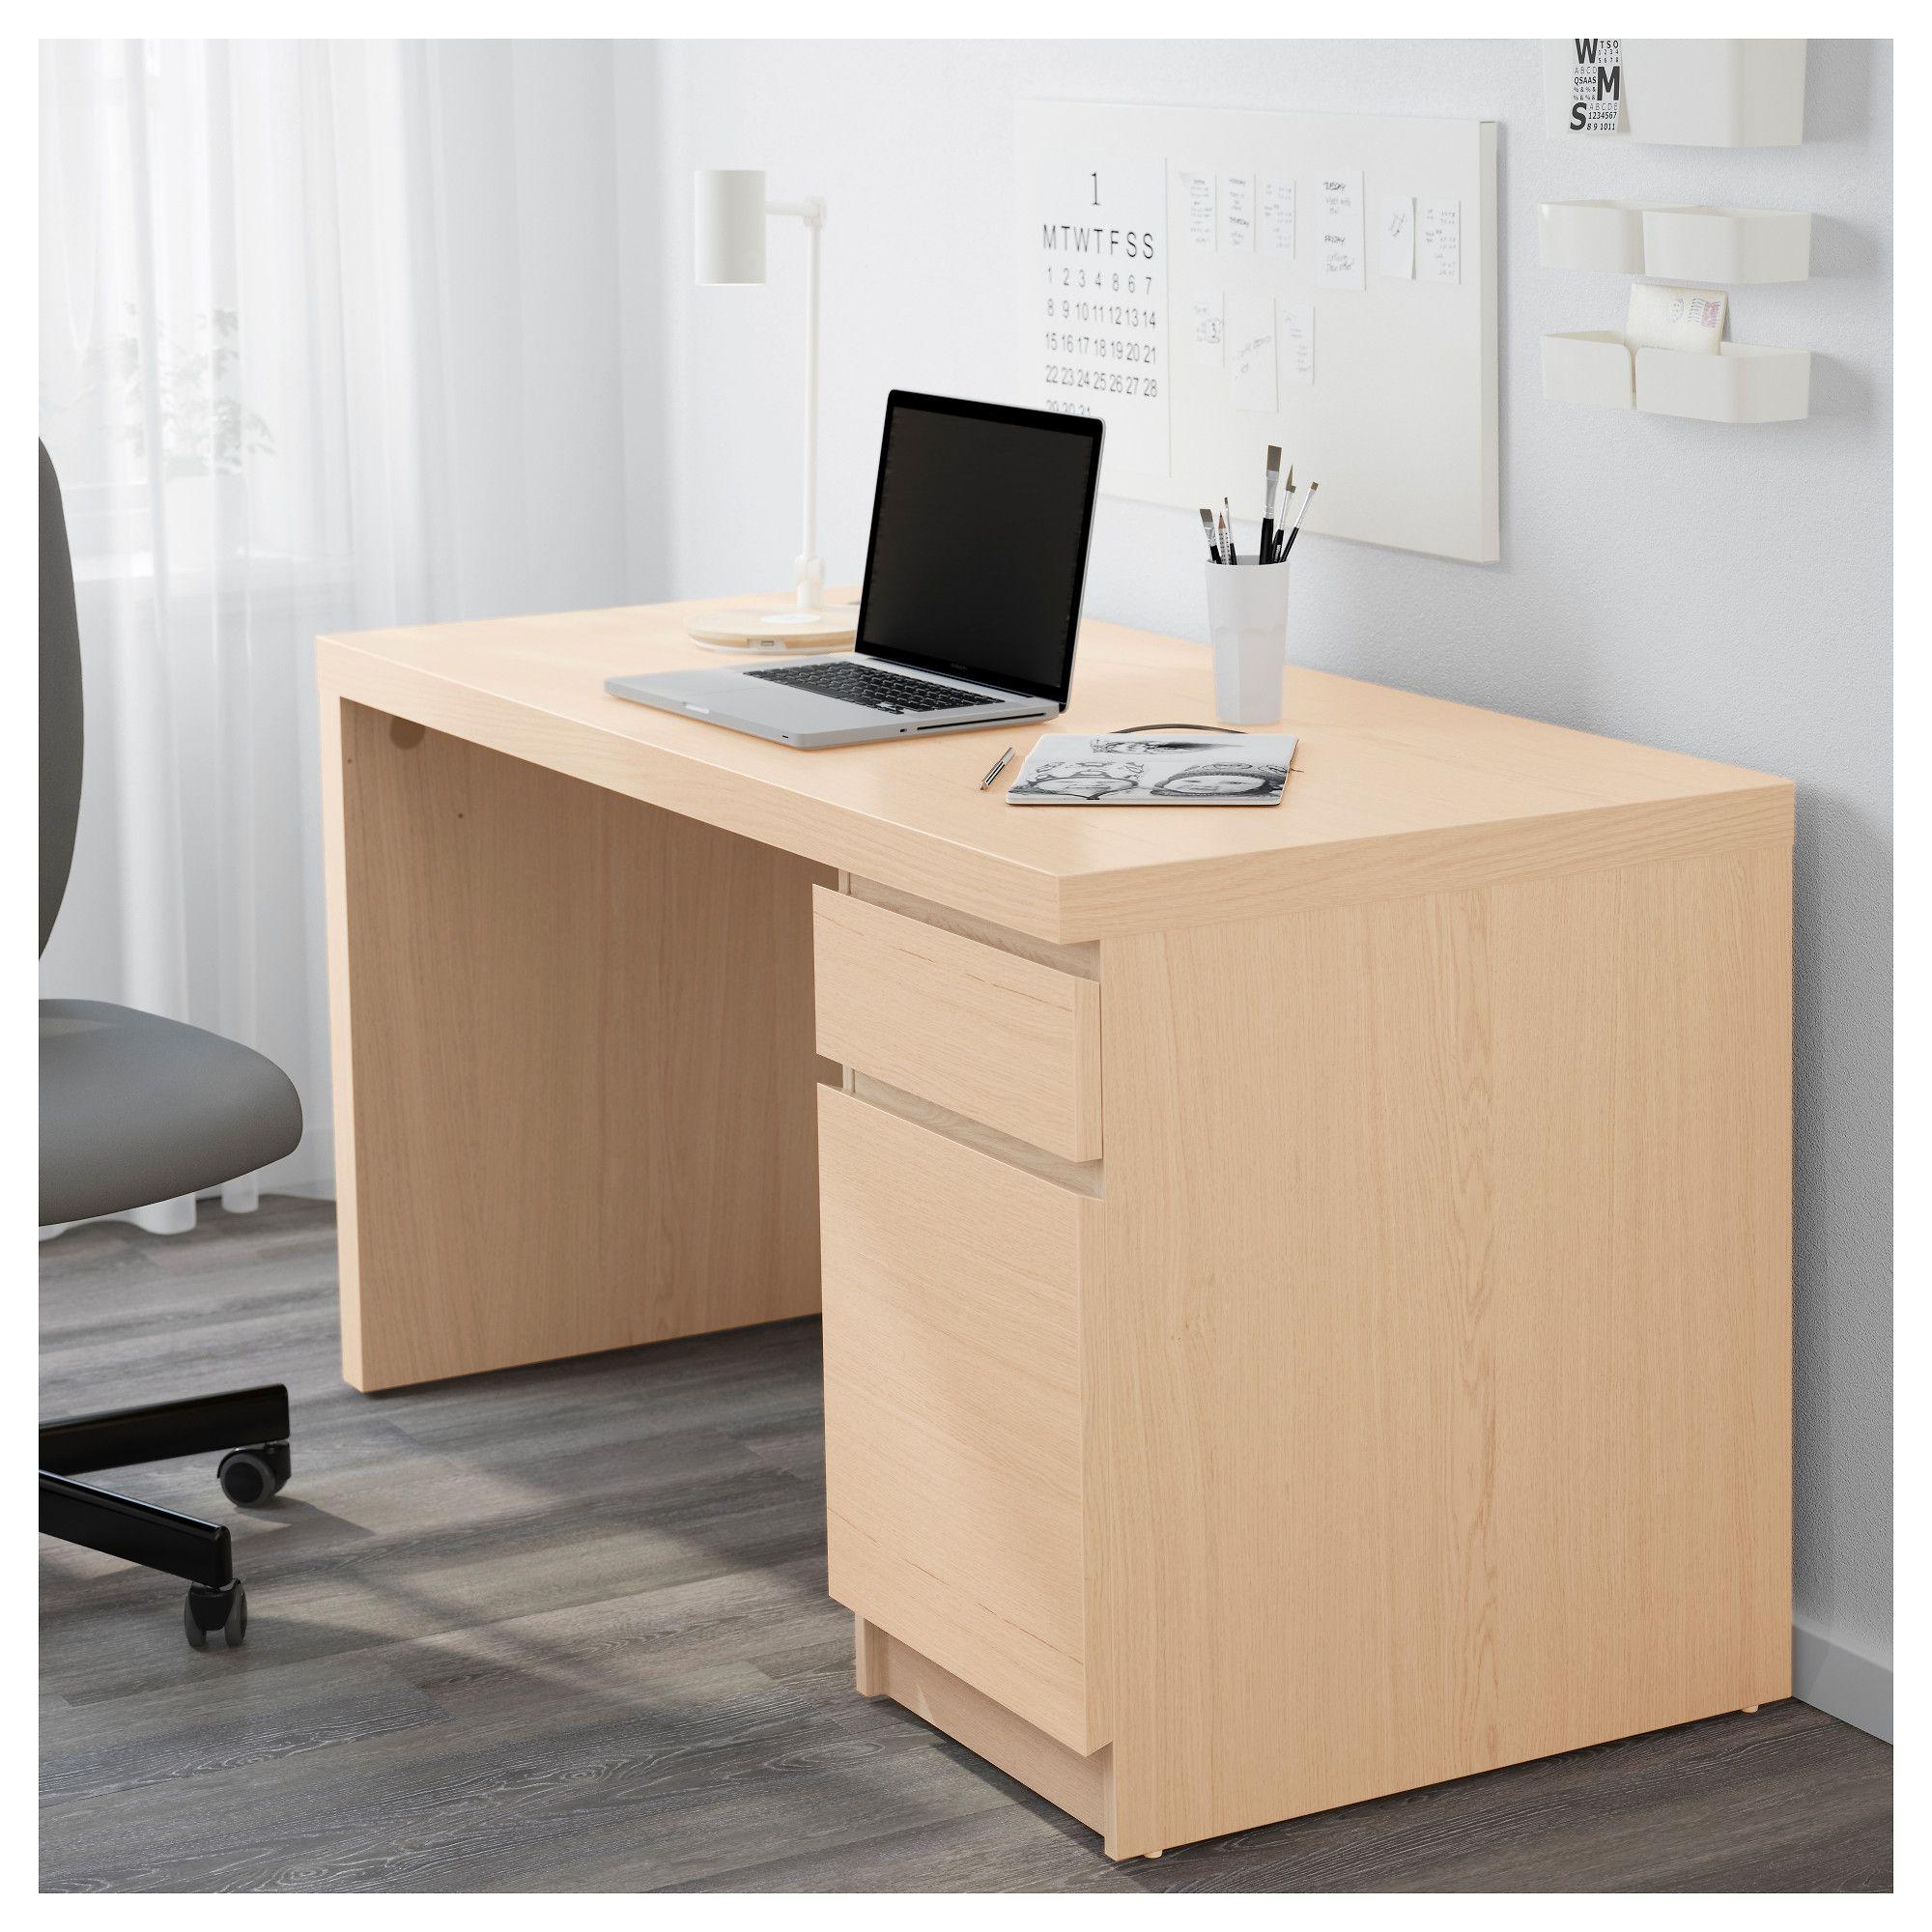 IKEA   MALM Desk White Stained Oak Veneer